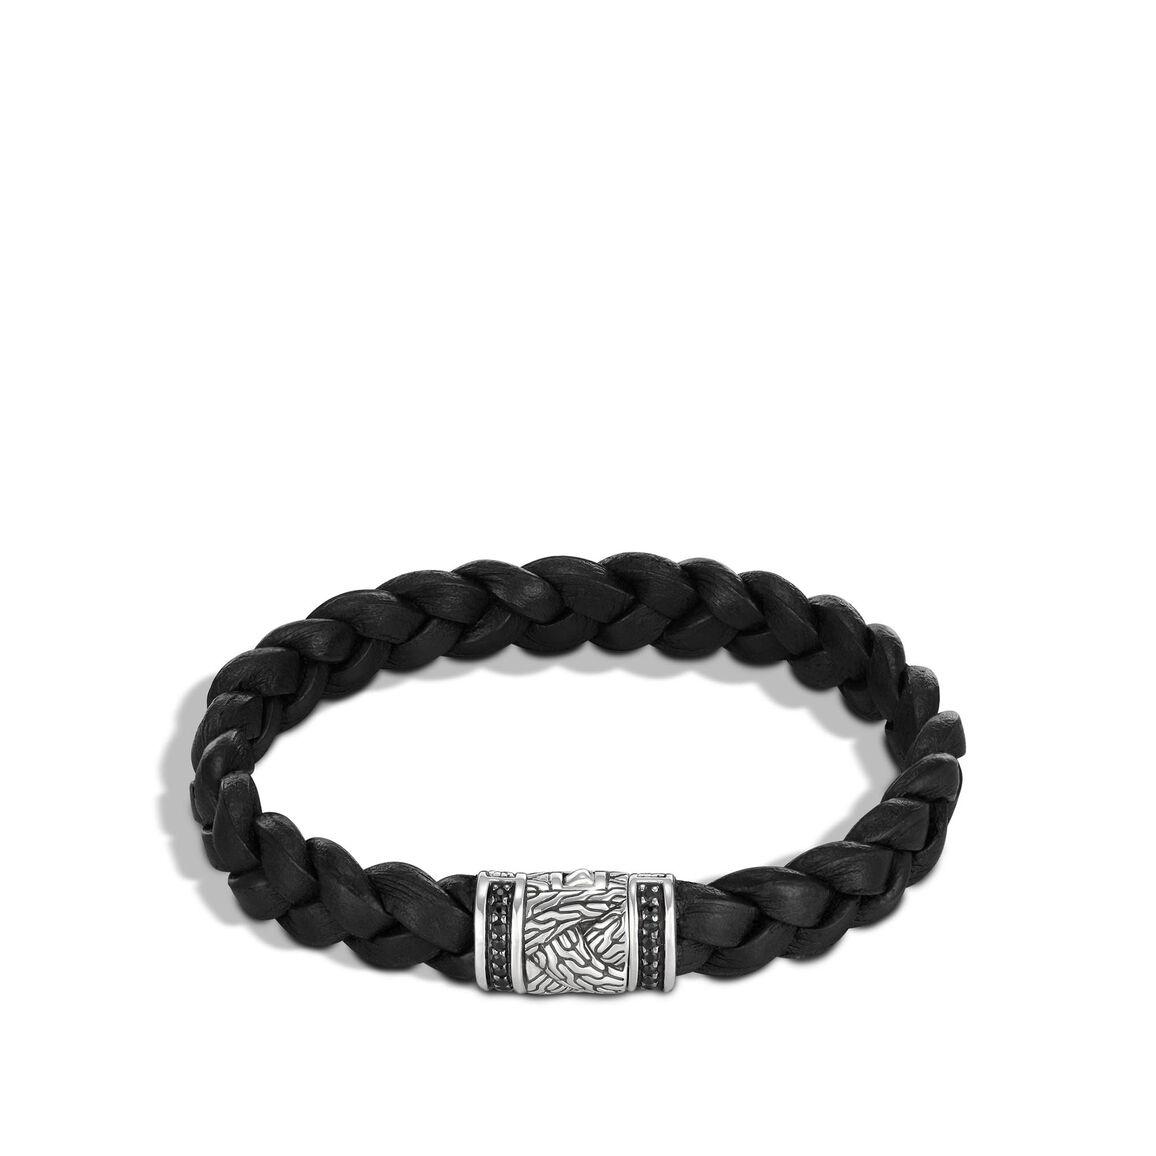 Braided Chain 10MM Bracelet, Silver, Leather, Gemstone